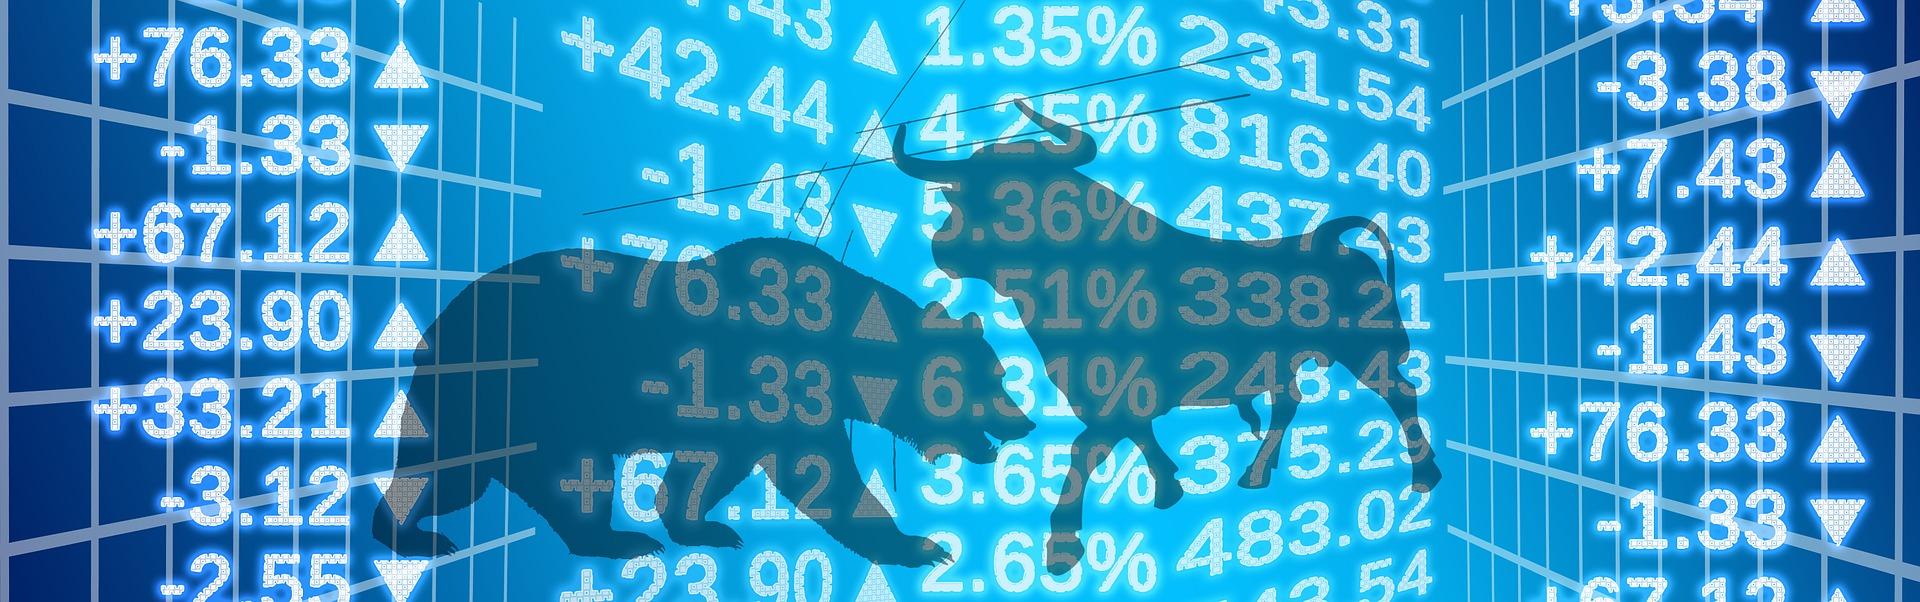 Featured Image for UK Fintech Bullish despite Political Uncertainty